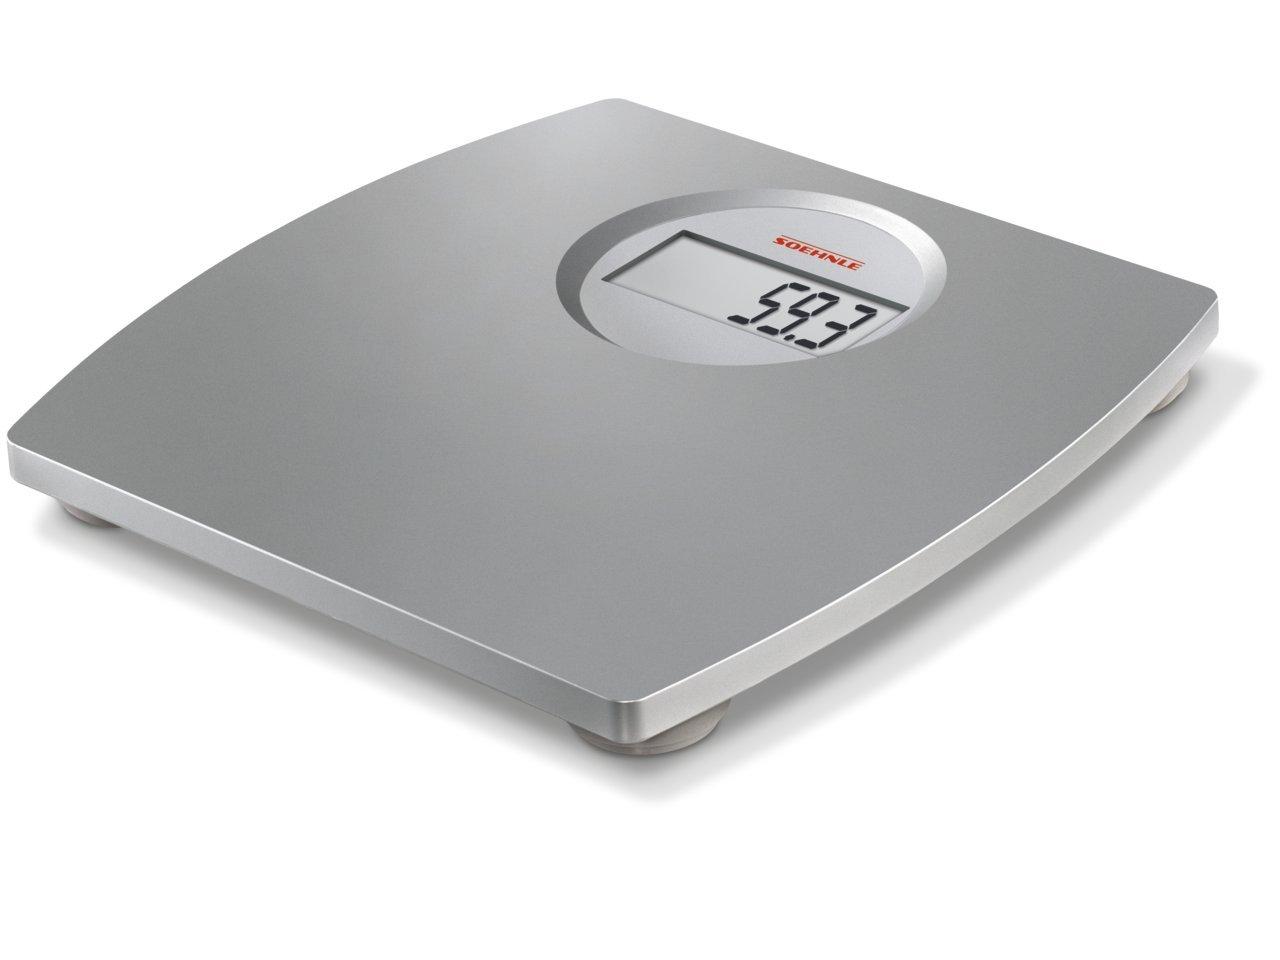 Soehnle 27231 Bilancia Digitale Gala XL 63166 pesapersona pesapersone